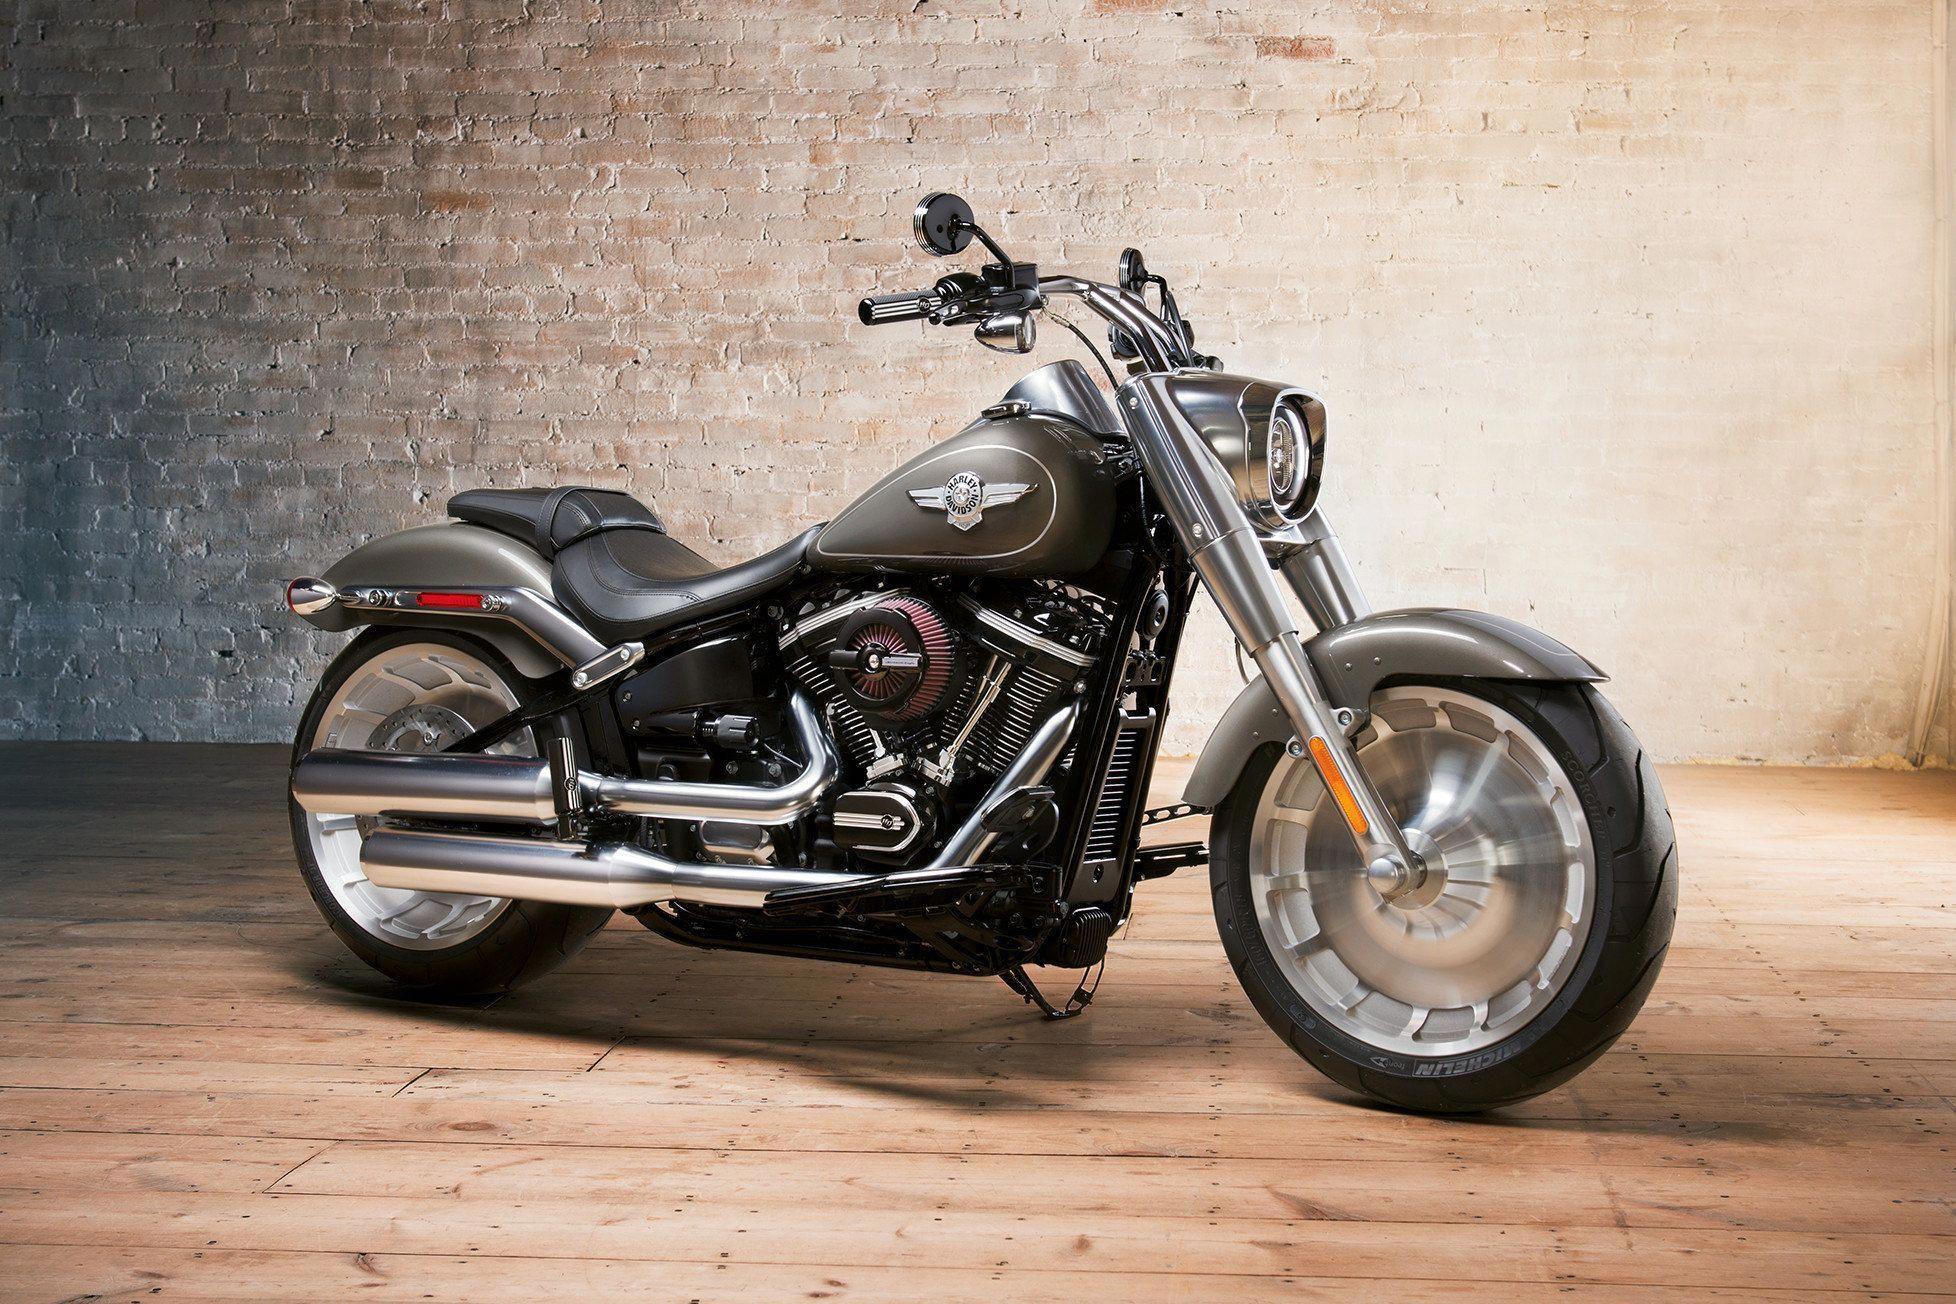 Harley Davidson Softail Breakout For Sale Uk Harleydavidsonsoftail Motorcycle Harley Harley Fatboy Harley Davidson Bikes